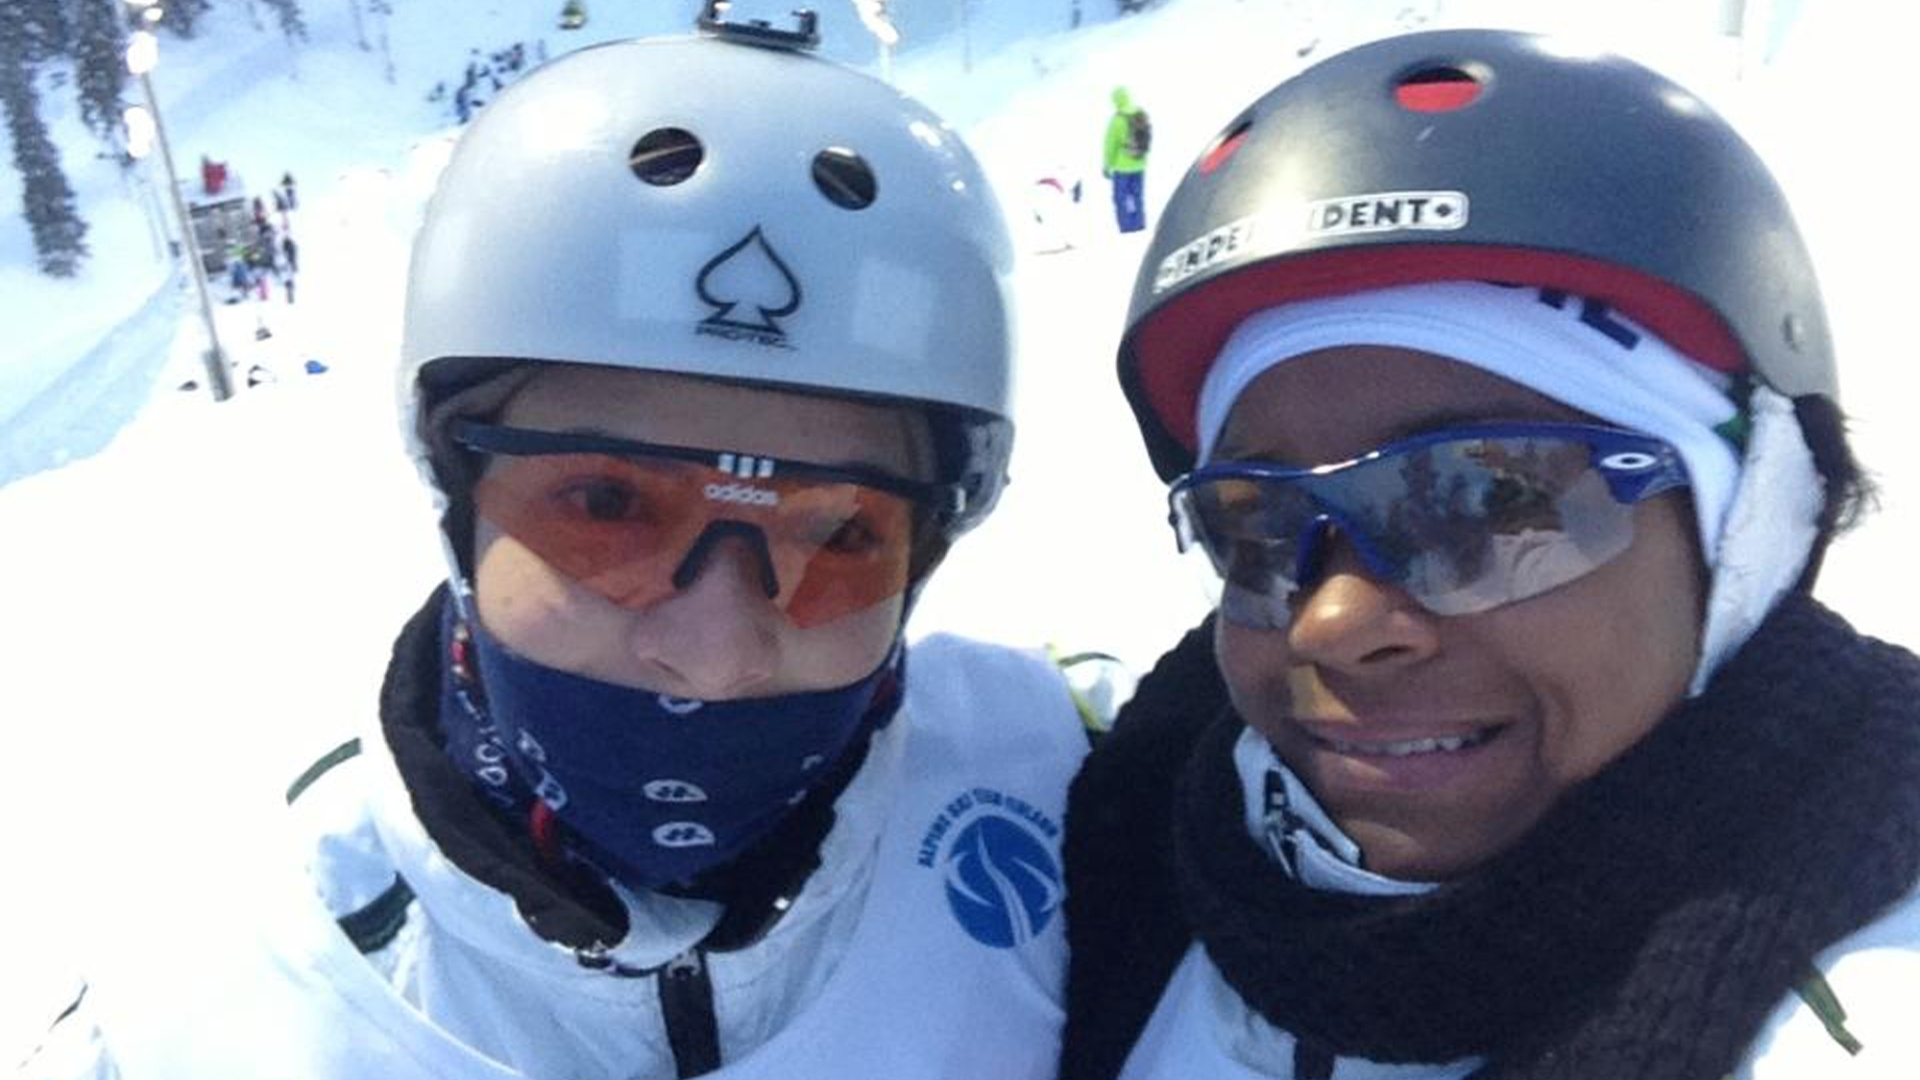 10.12.2013 - Laís Souza e Josi Santos, dupla brasileira do esqui freestyle